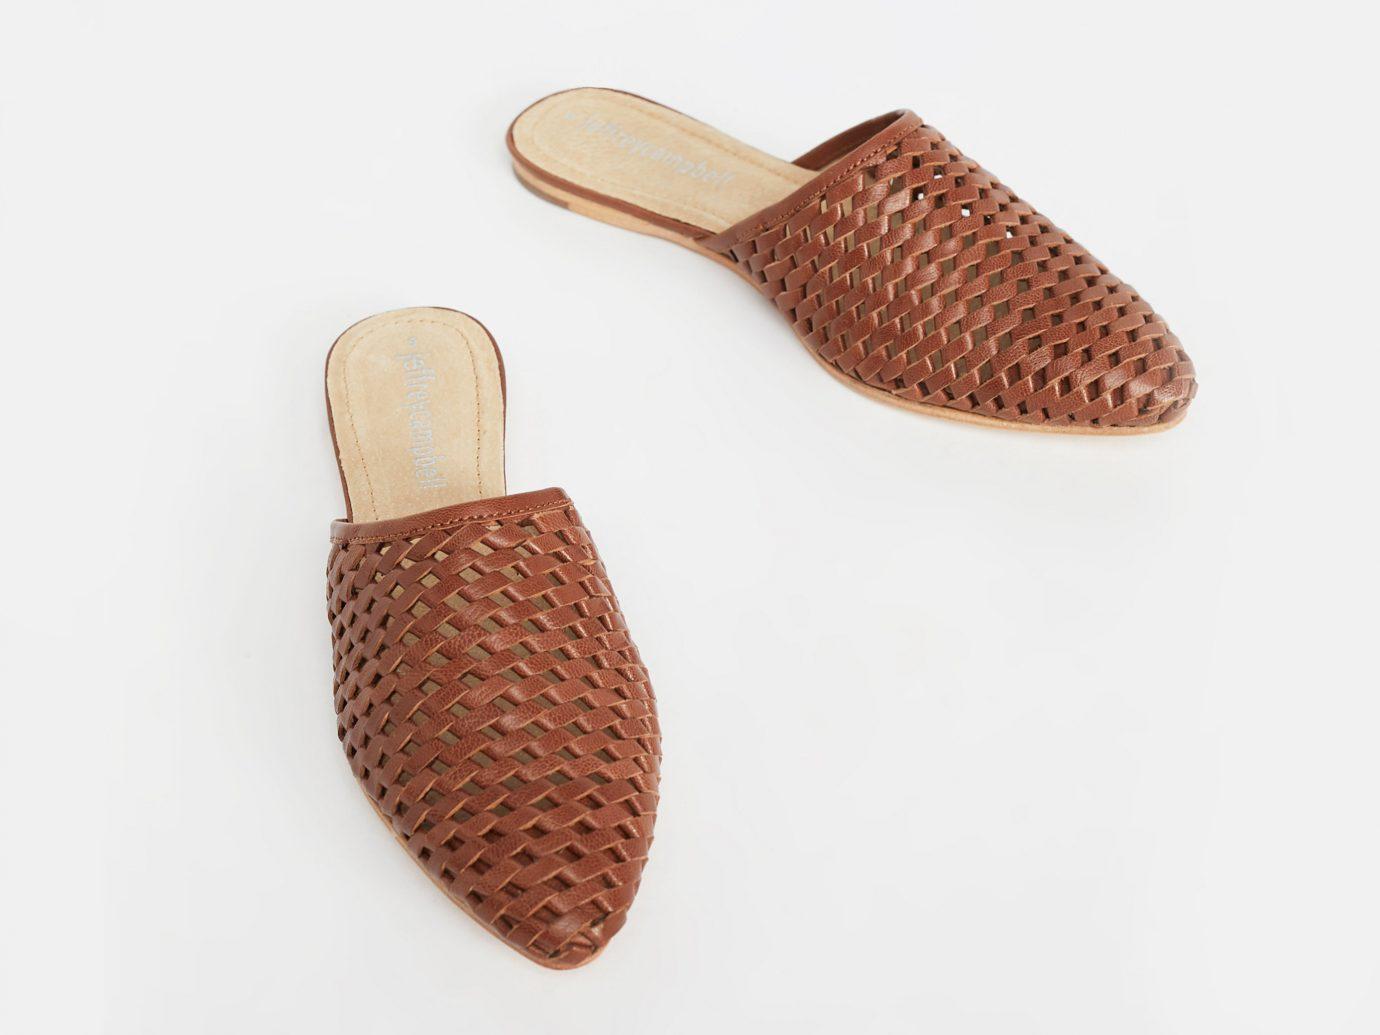 Style + Design footwear brown shoe slipper accessory outdoor shoe product design sandal